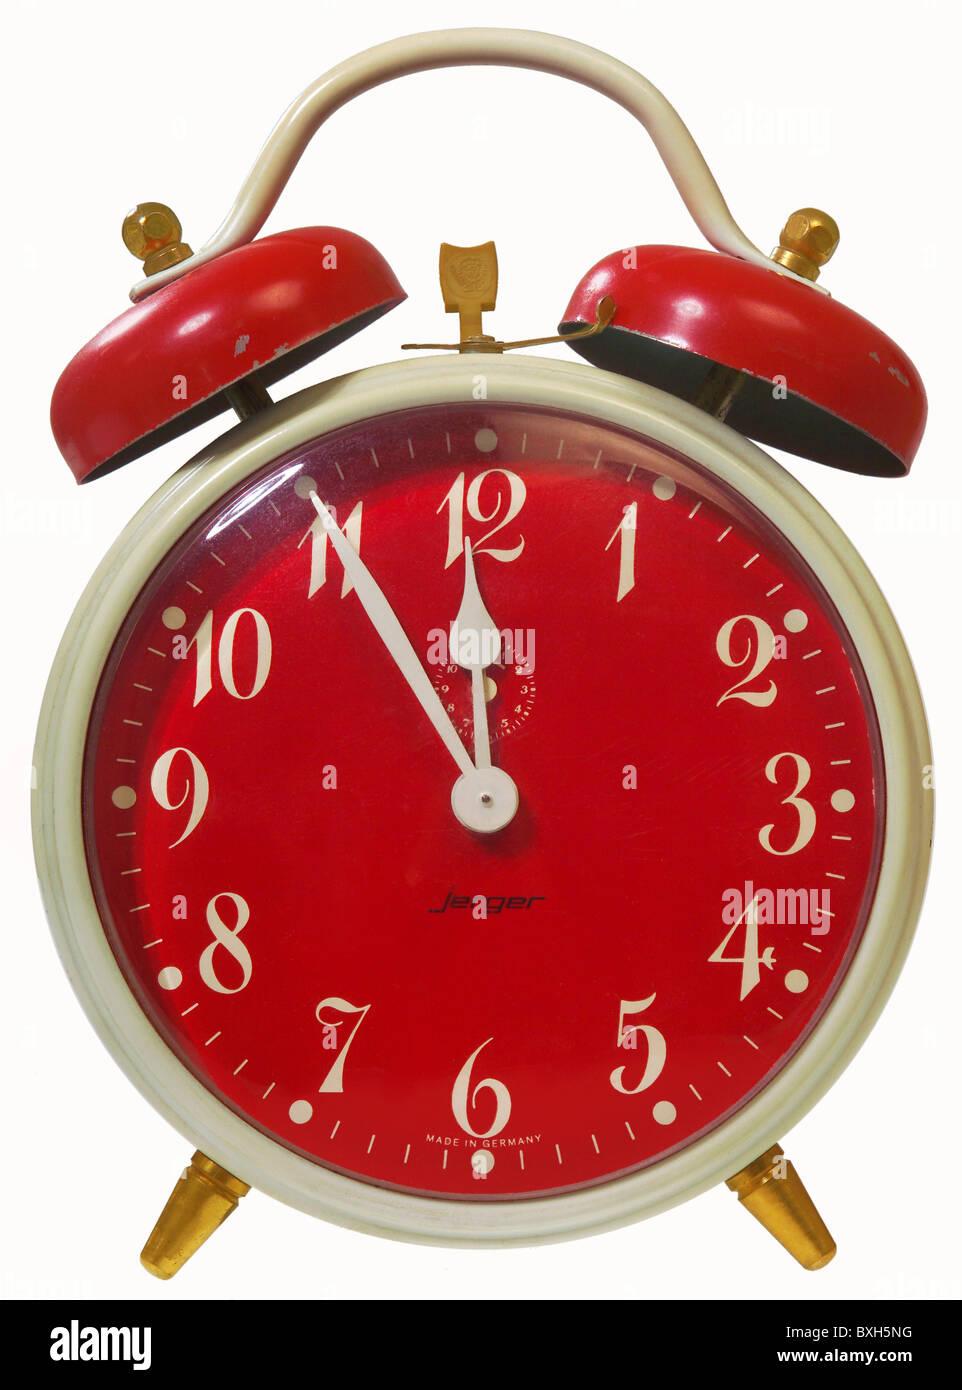 clocks alarm clock five minutes before twelve germany circa 1978 stock photo royalty free. Black Bedroom Furniture Sets. Home Design Ideas